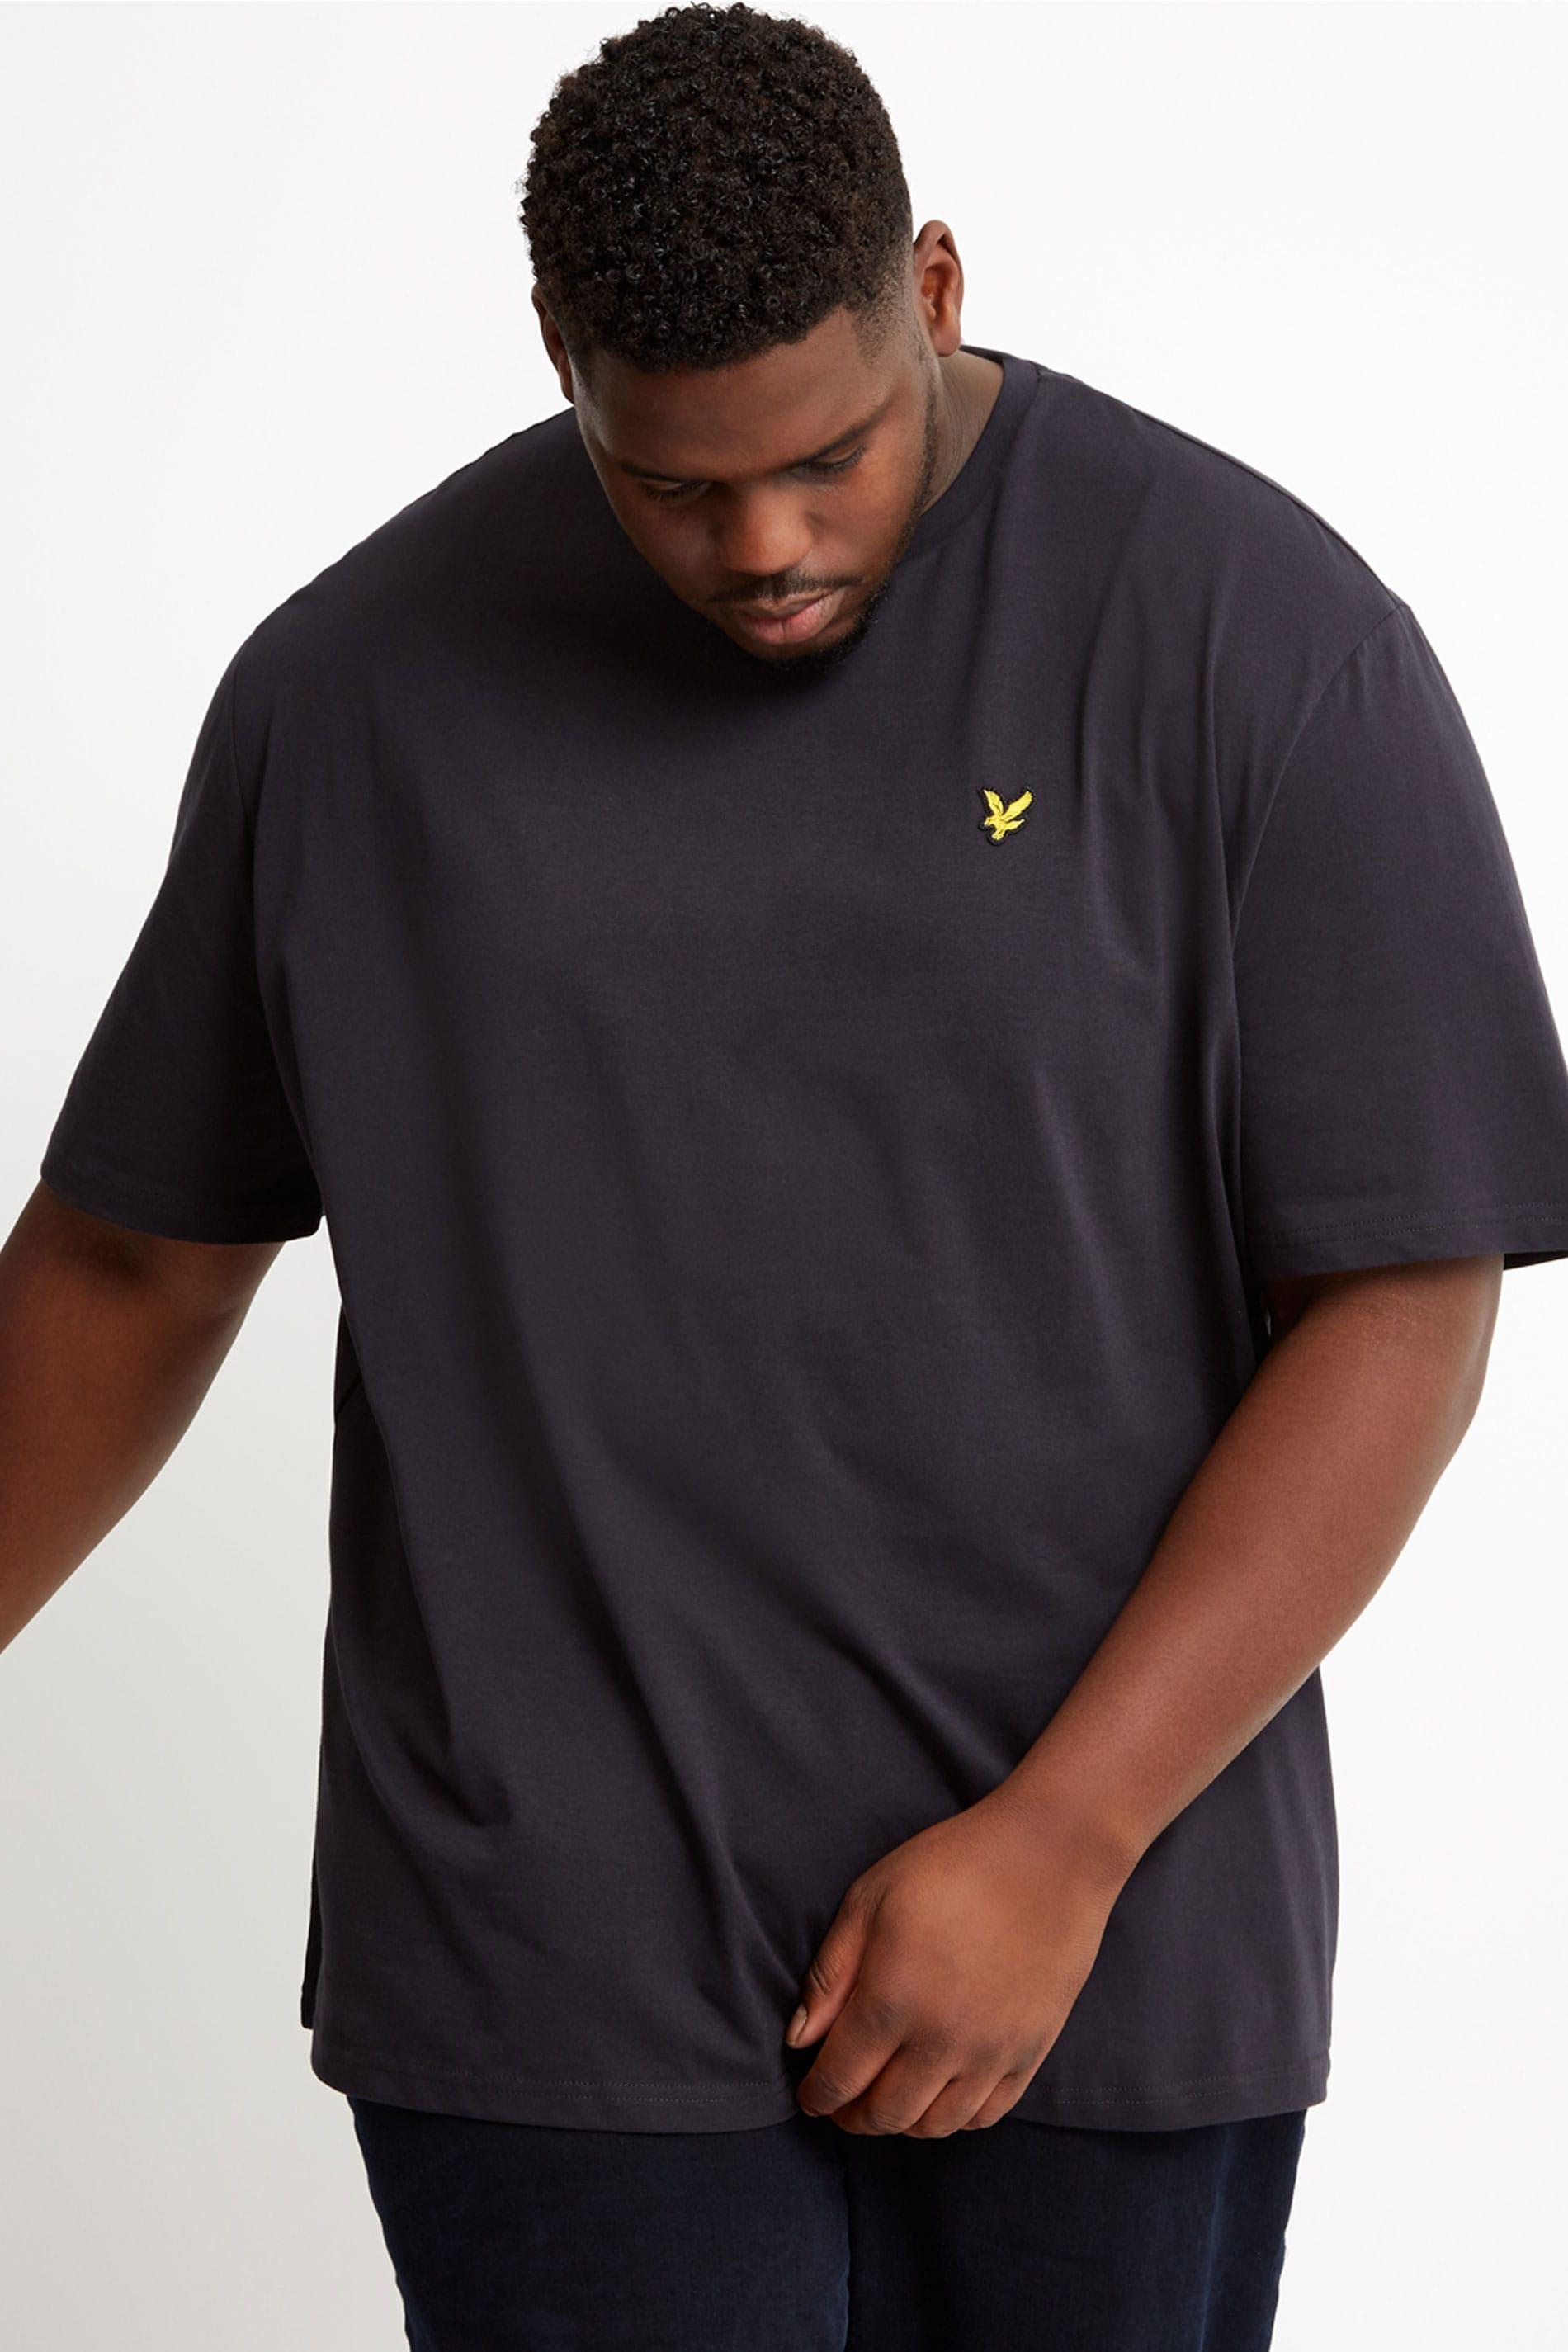 LYLE & SCOTT Navy Crew Neck T-Shirt